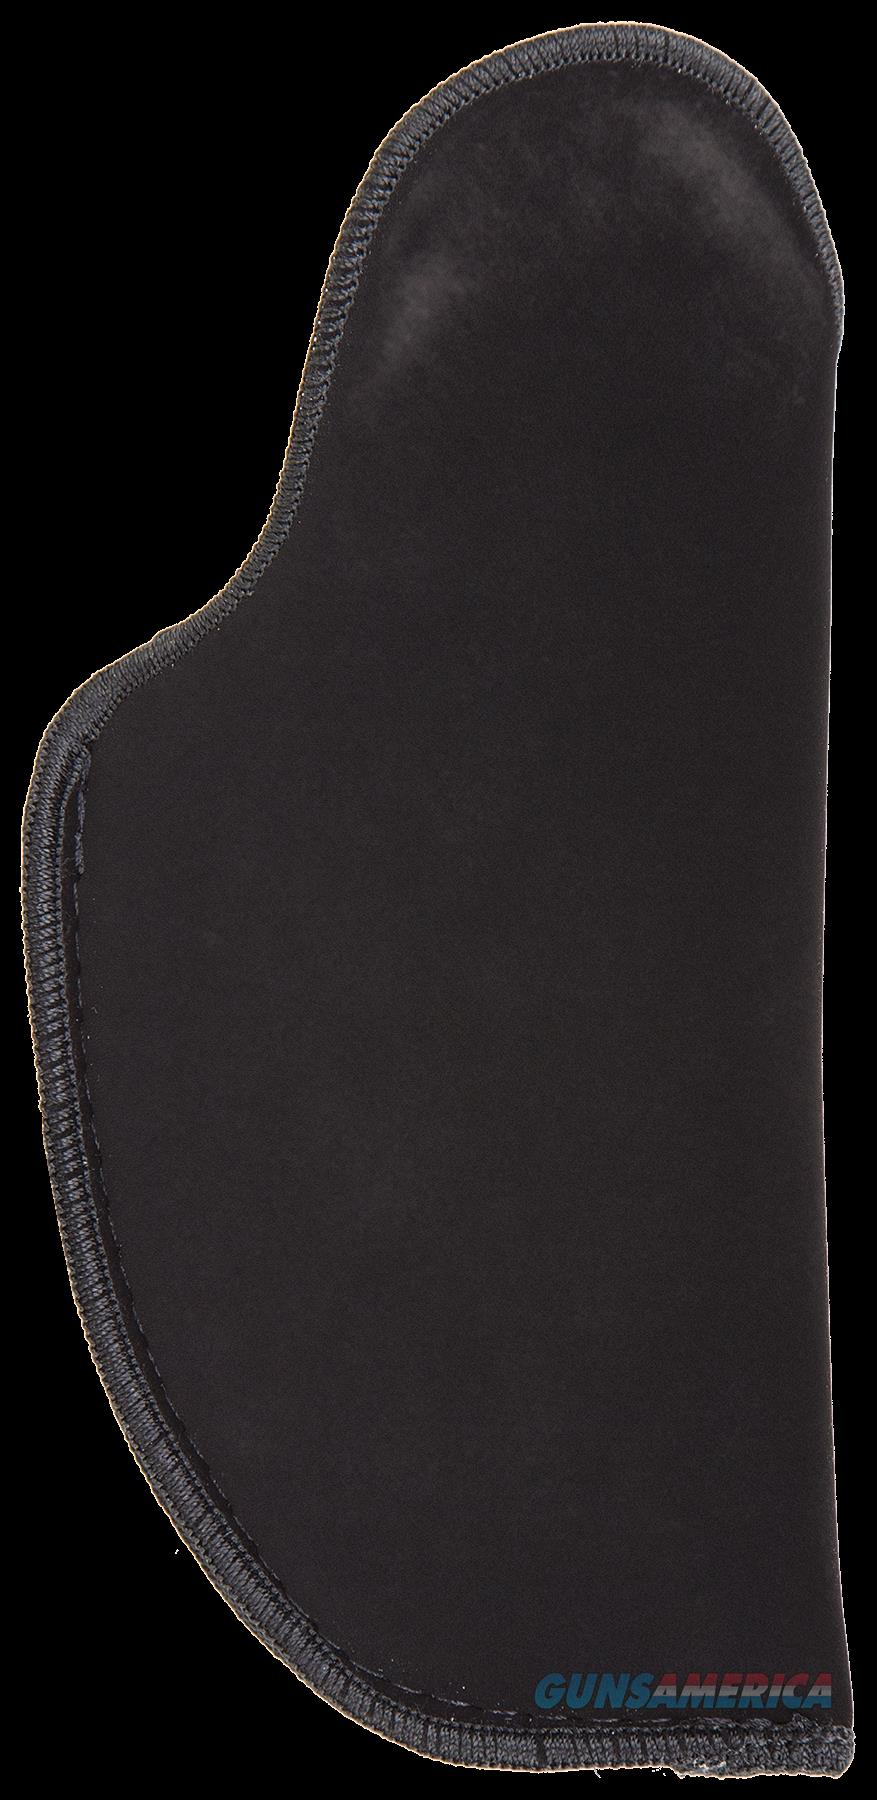 Blackhawk Inside The Pants, Bhwk 73ip00bkl I-p Clip Holster Lh Blk  Guns > Pistols > 1911 Pistol Copies (non-Colt)